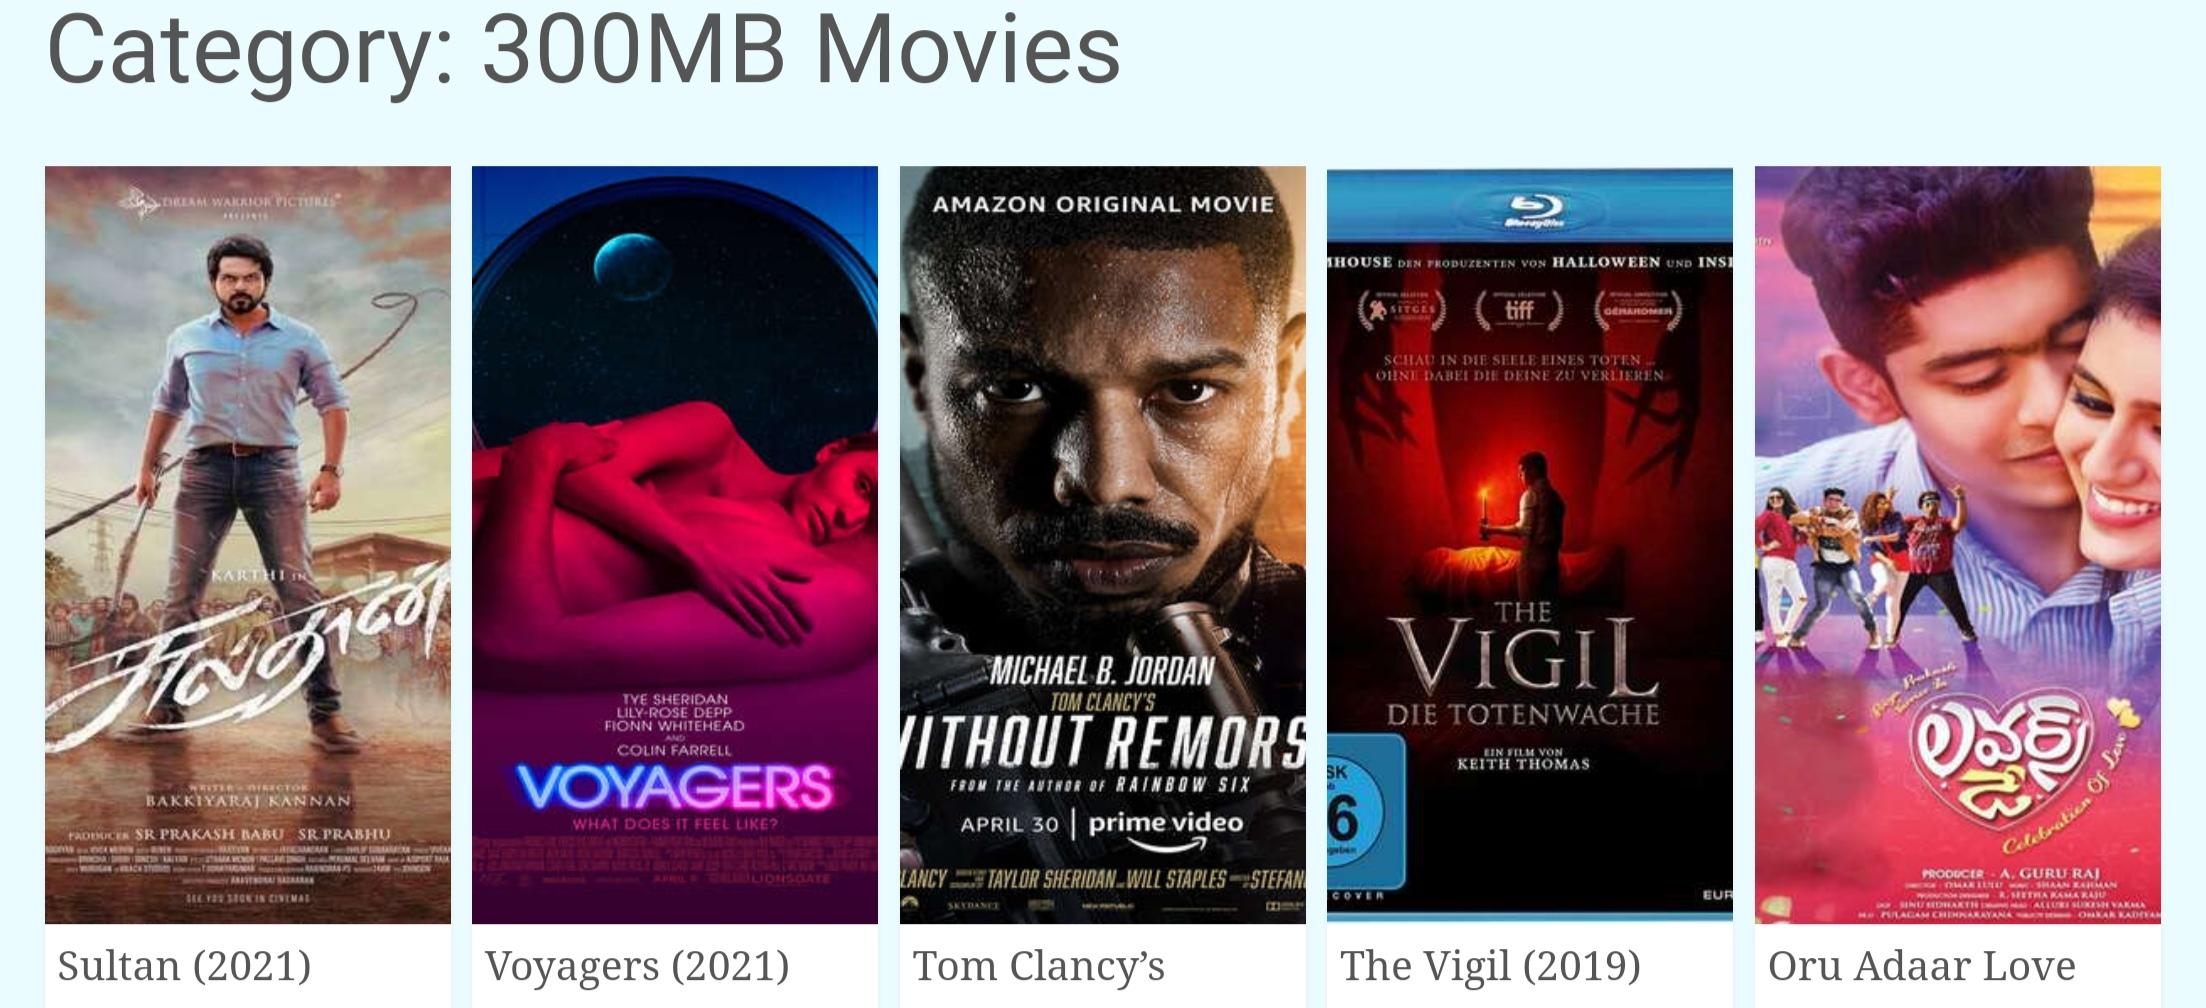 SSR movies .com 300MB movies download